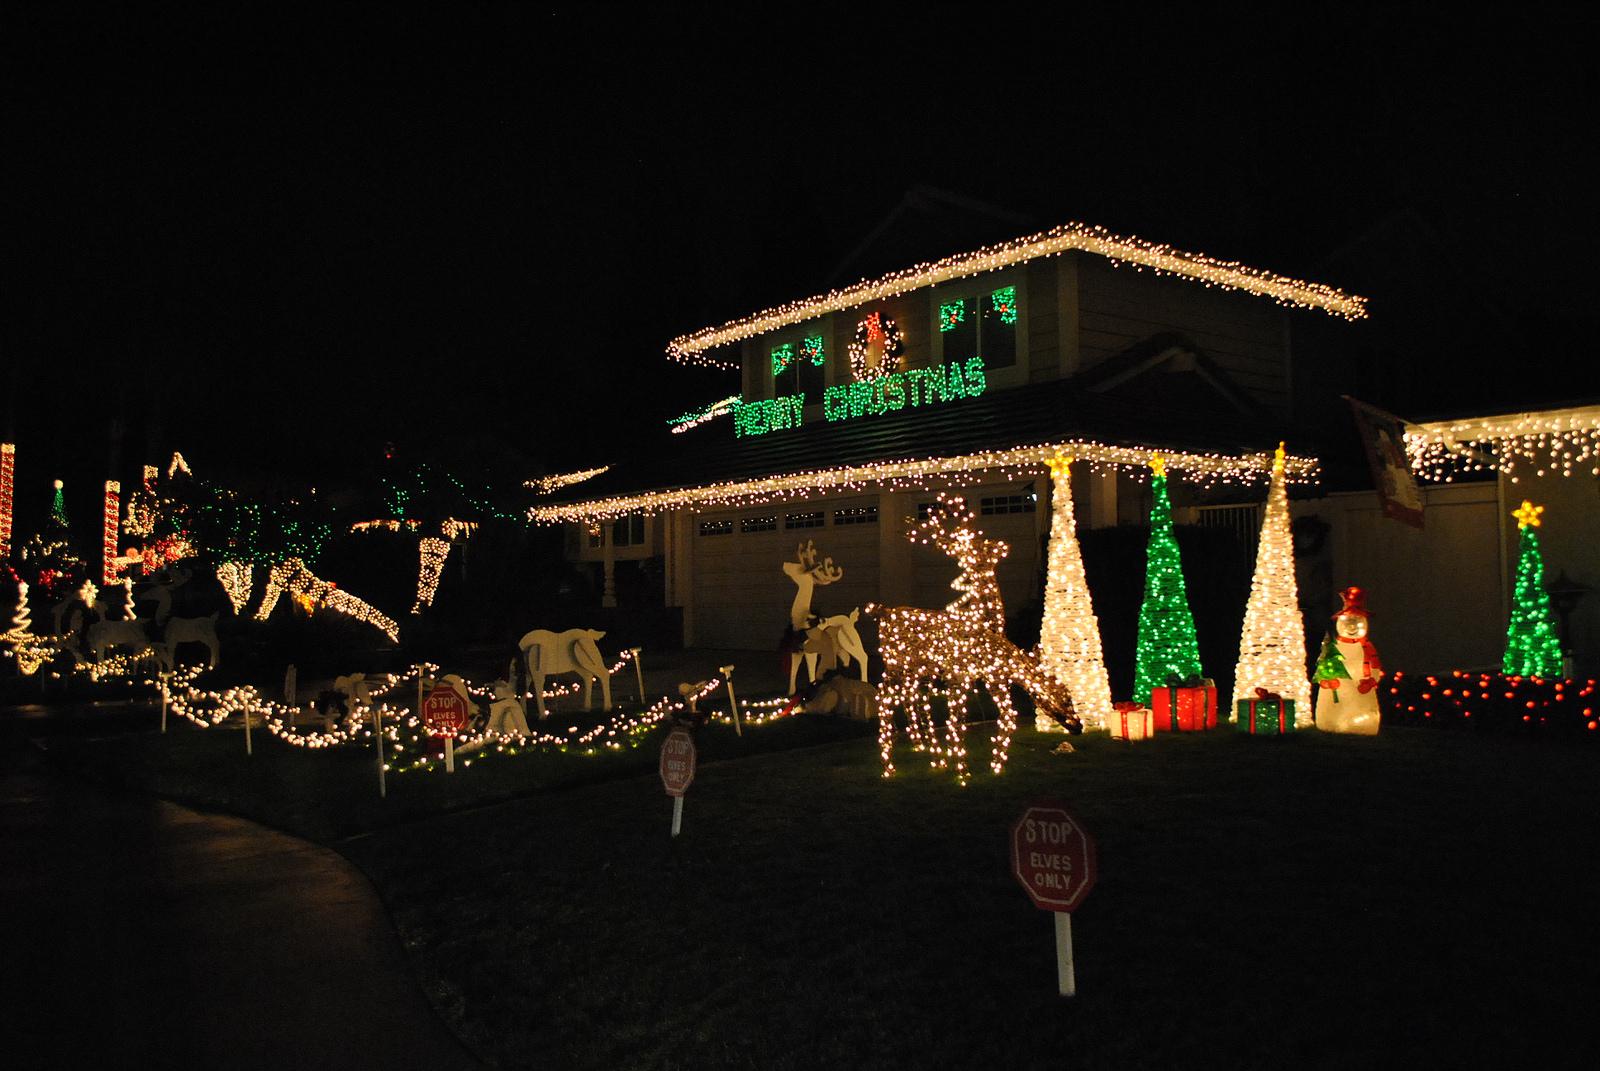 Brea Christmas Lights.Christmas Light Displays And Home Holiday Decorations Around